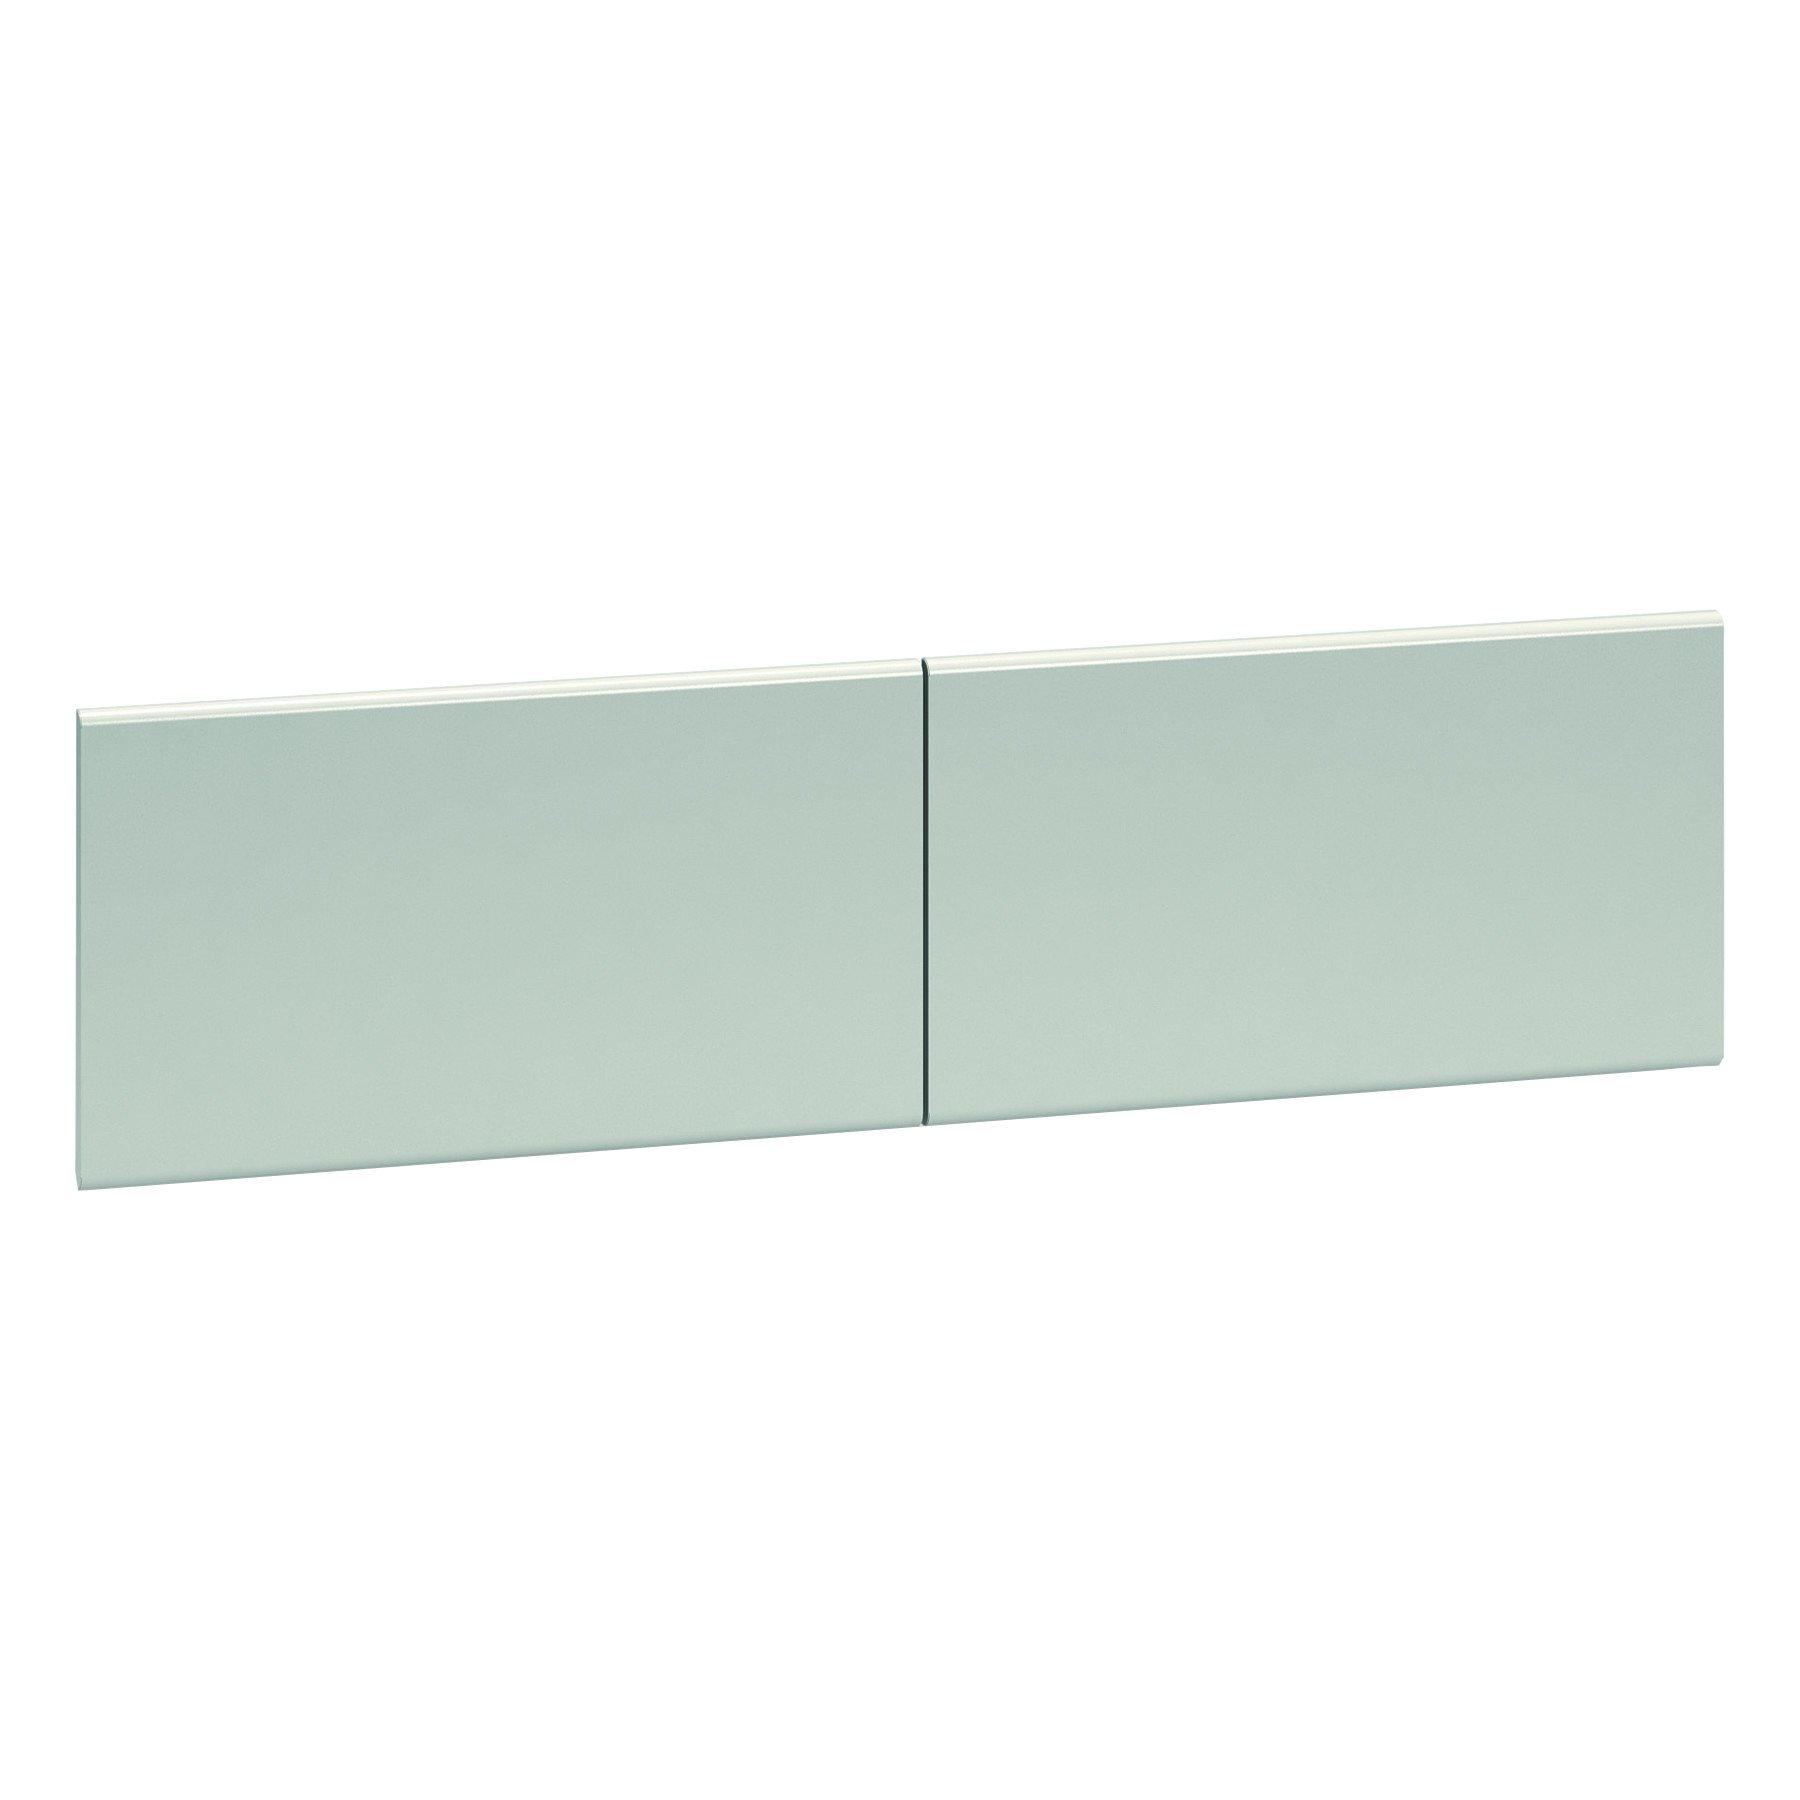 HON 386015LQ 38000 Series Hutch Flipper Doors For 60''w Open Shelf, 30w x 15h, Light Gray